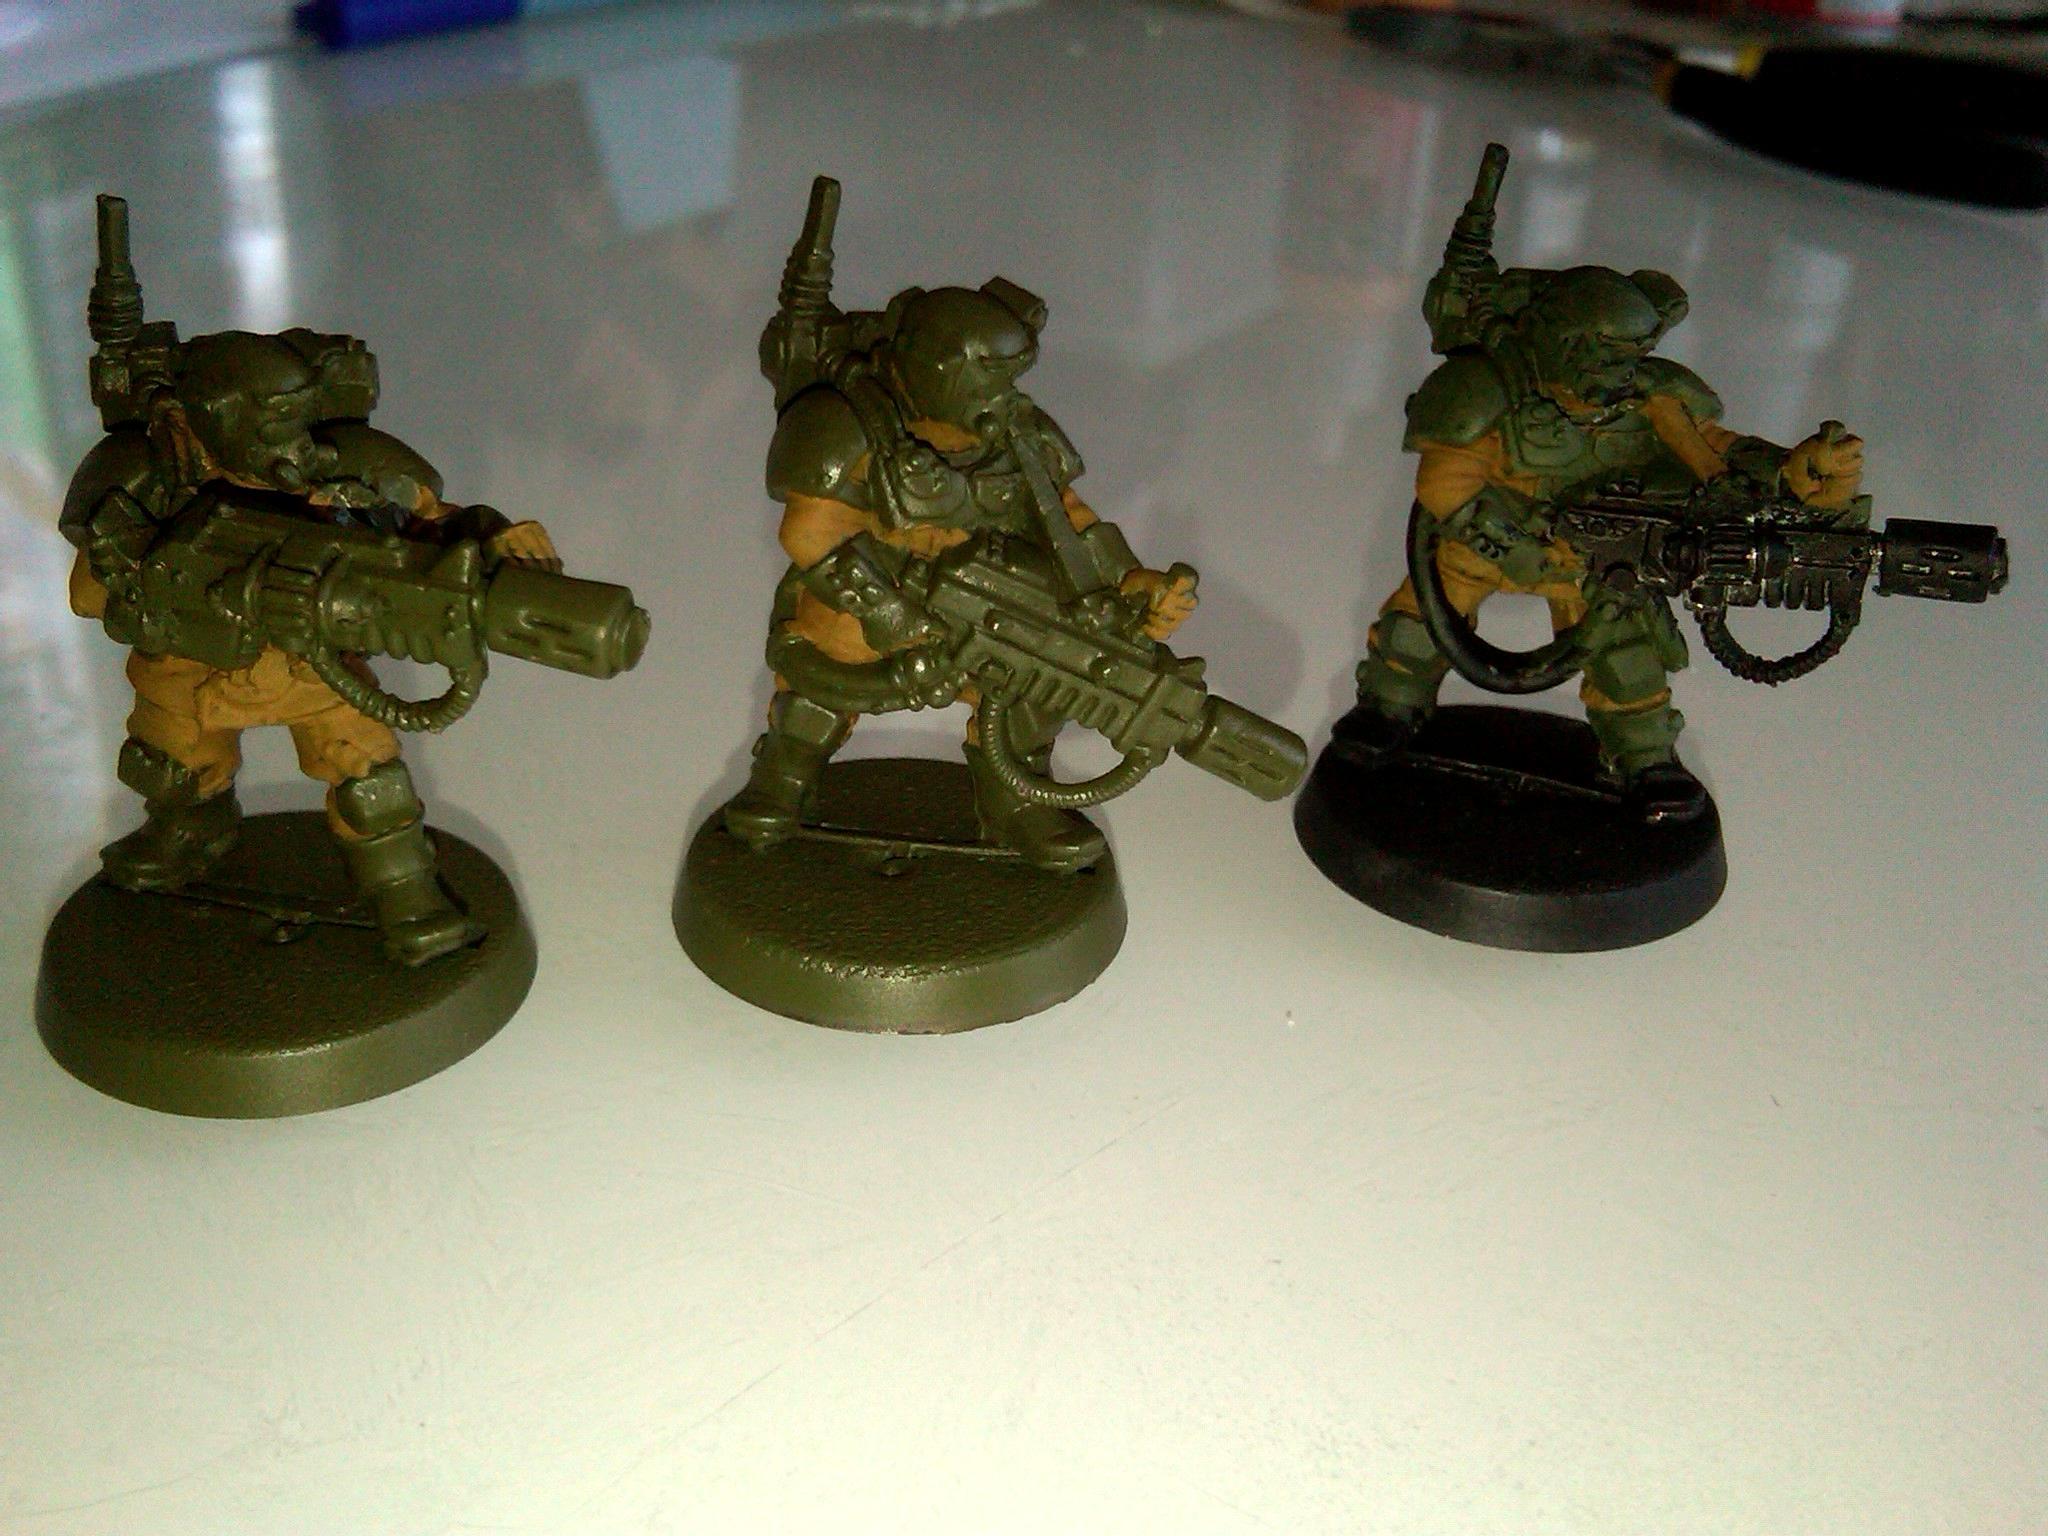 8th, Cadians, Carapace, Cut, Imperial Guard, Kasrkin, Meltagun, Metal, Sergeant, Squad, Veteran